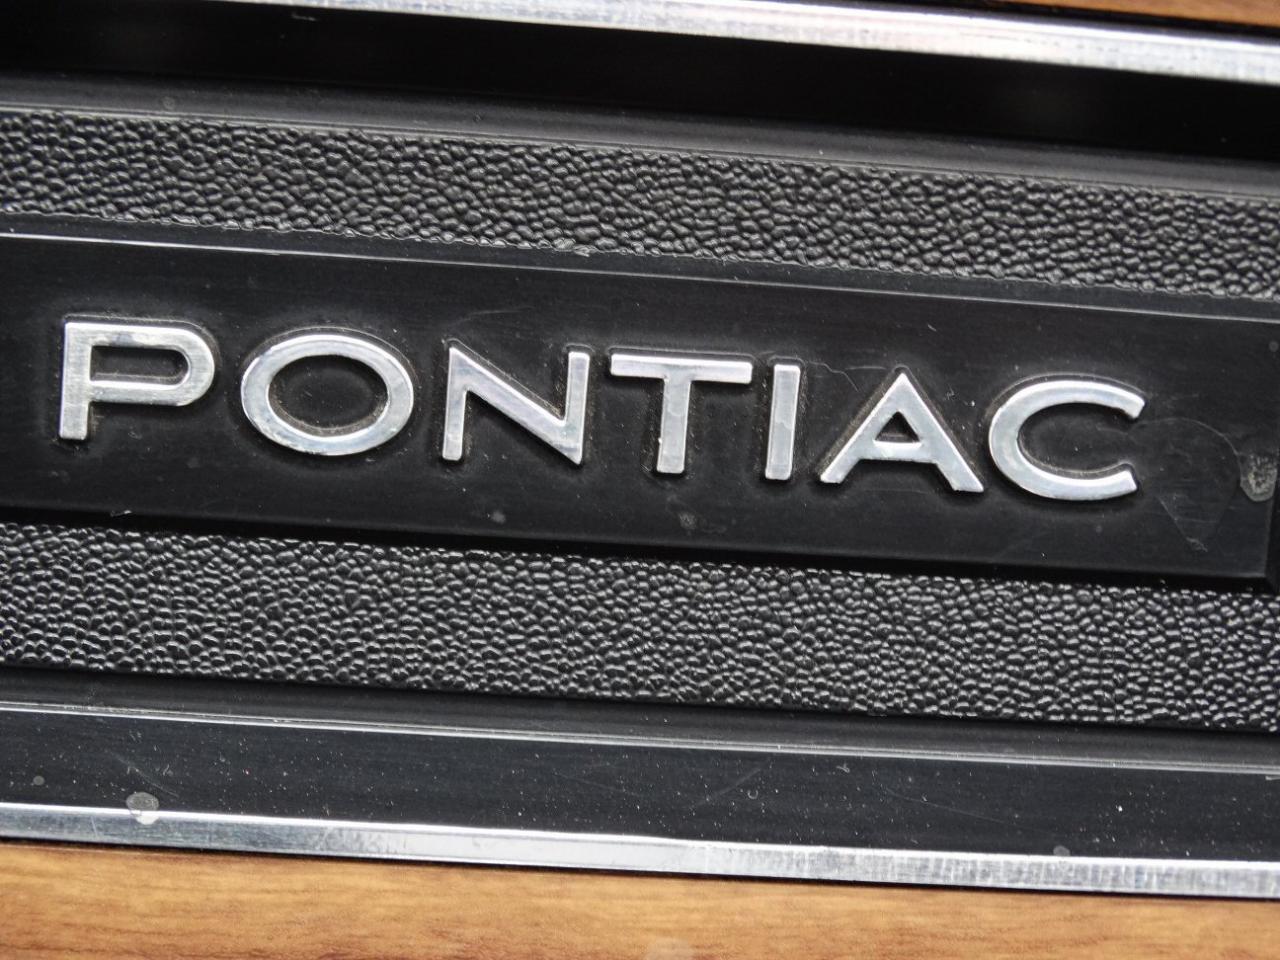 Large Picture of 1970 Pontiac GTO located in Alpharetta Georgia - $71,000.00 - KF5T